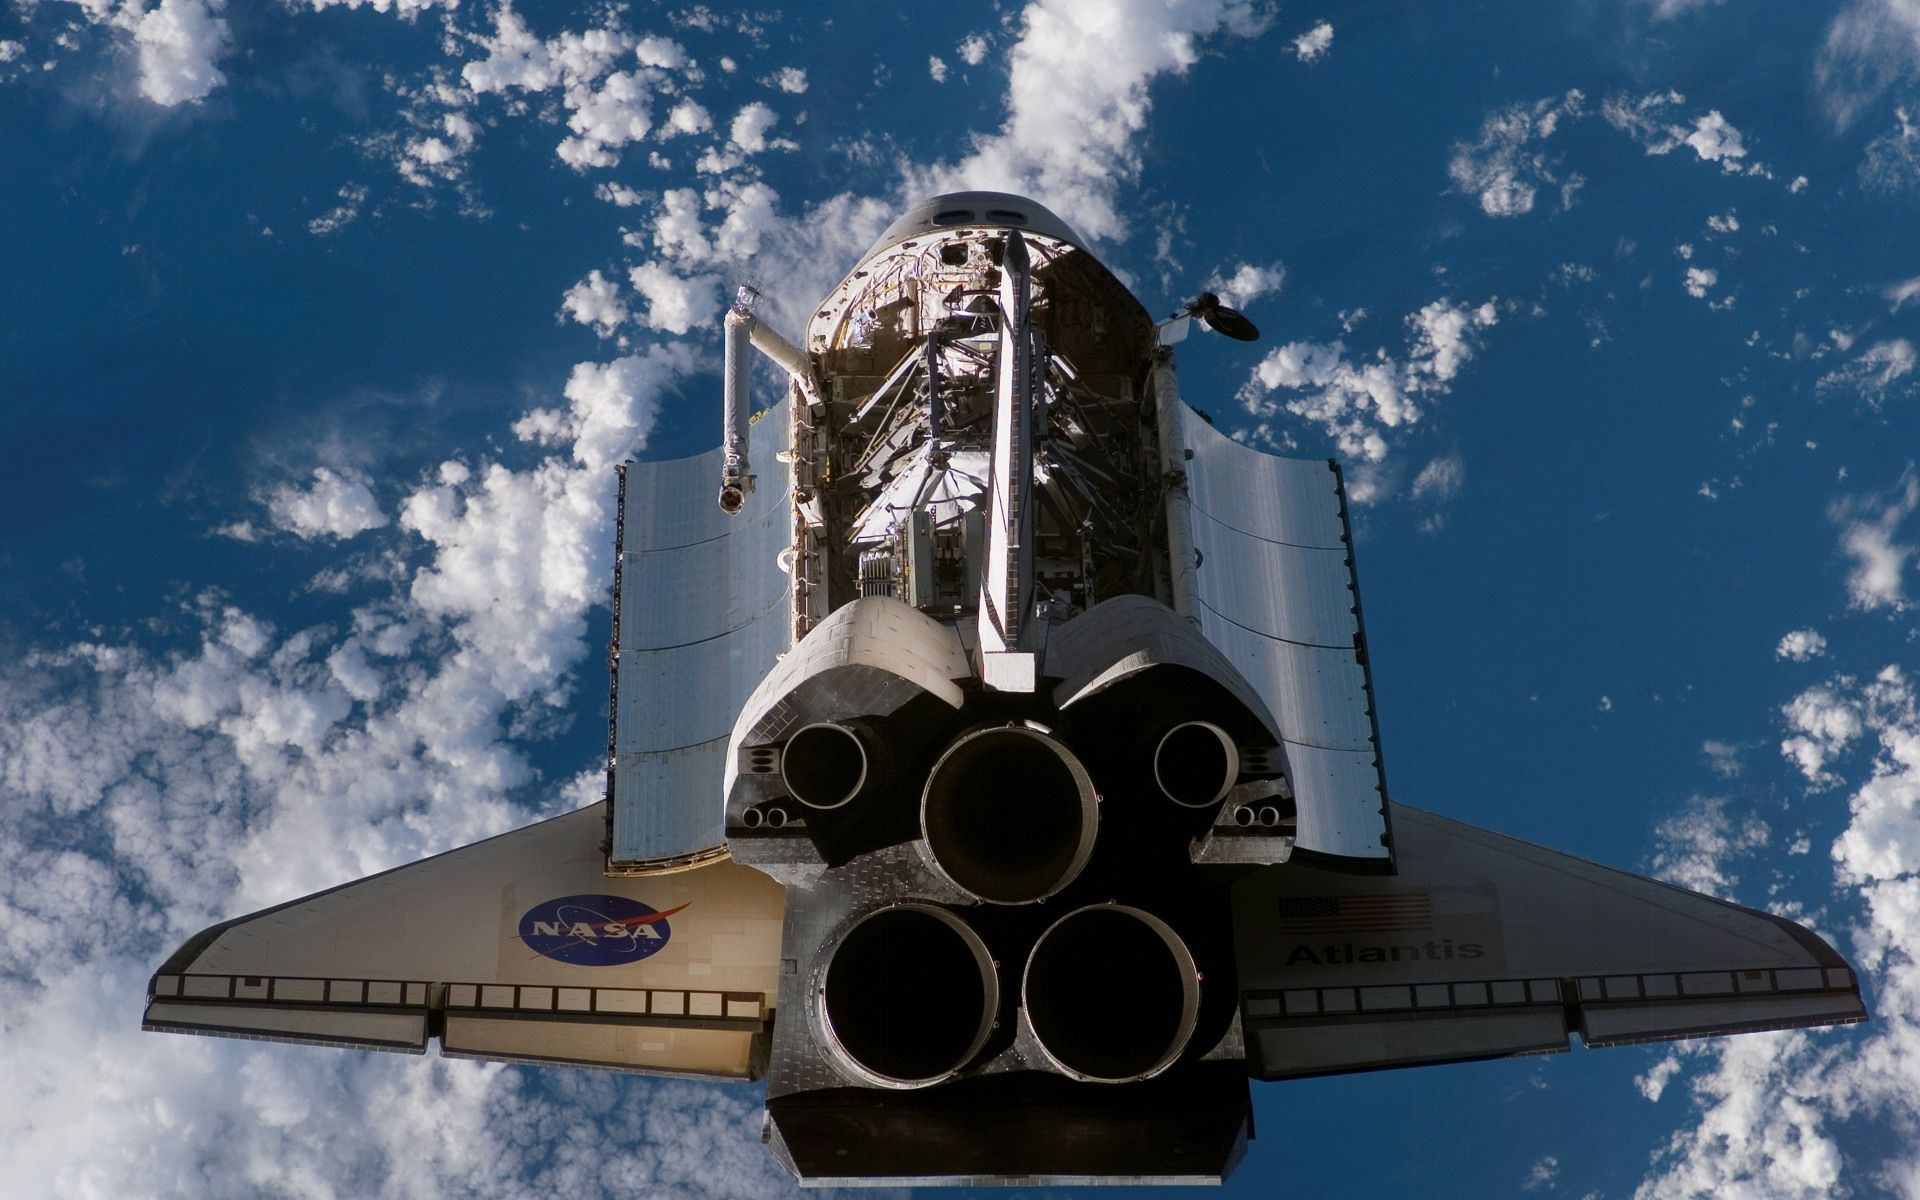 nasa new shuttle spacecraft - photo #17